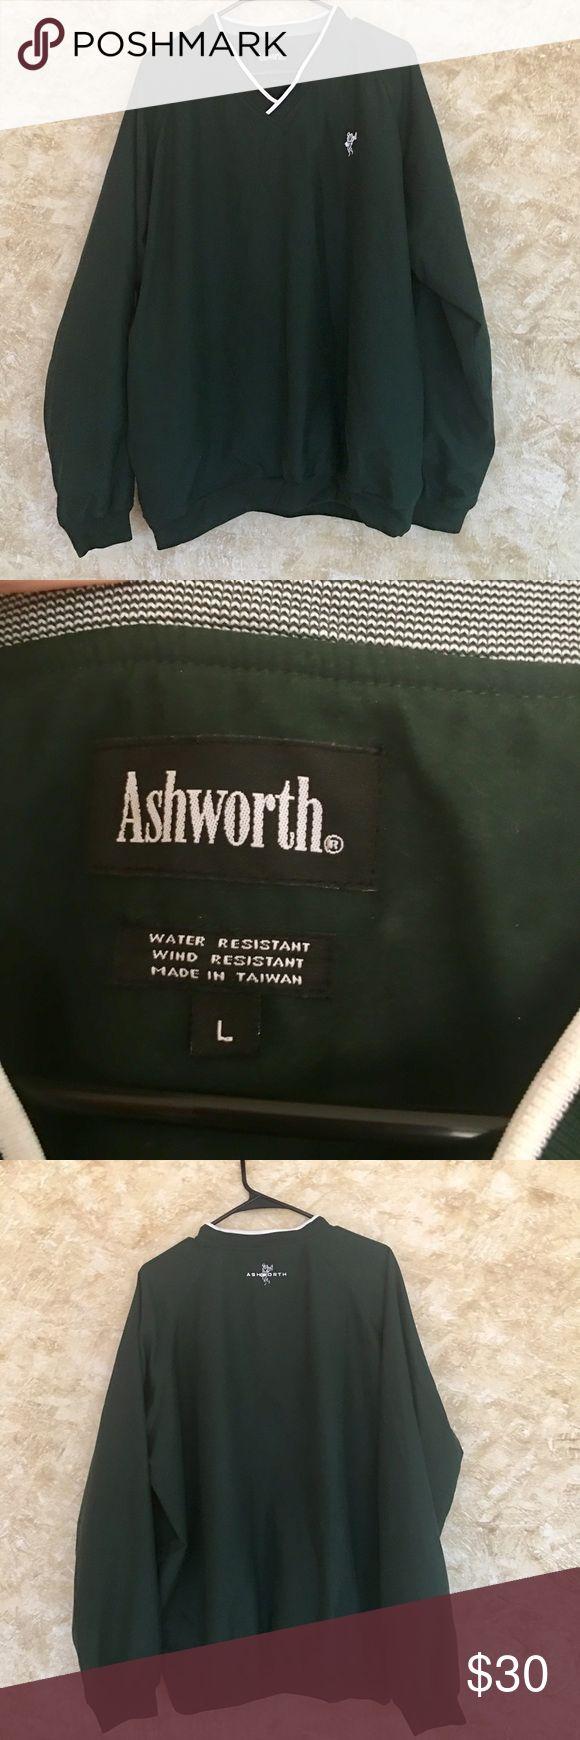 Ashworth pullover golf jacket water and wind proof Men's Ashworth Golf pullover, water and wind resistant Large ashworth Jackets & Coats Windbreakers